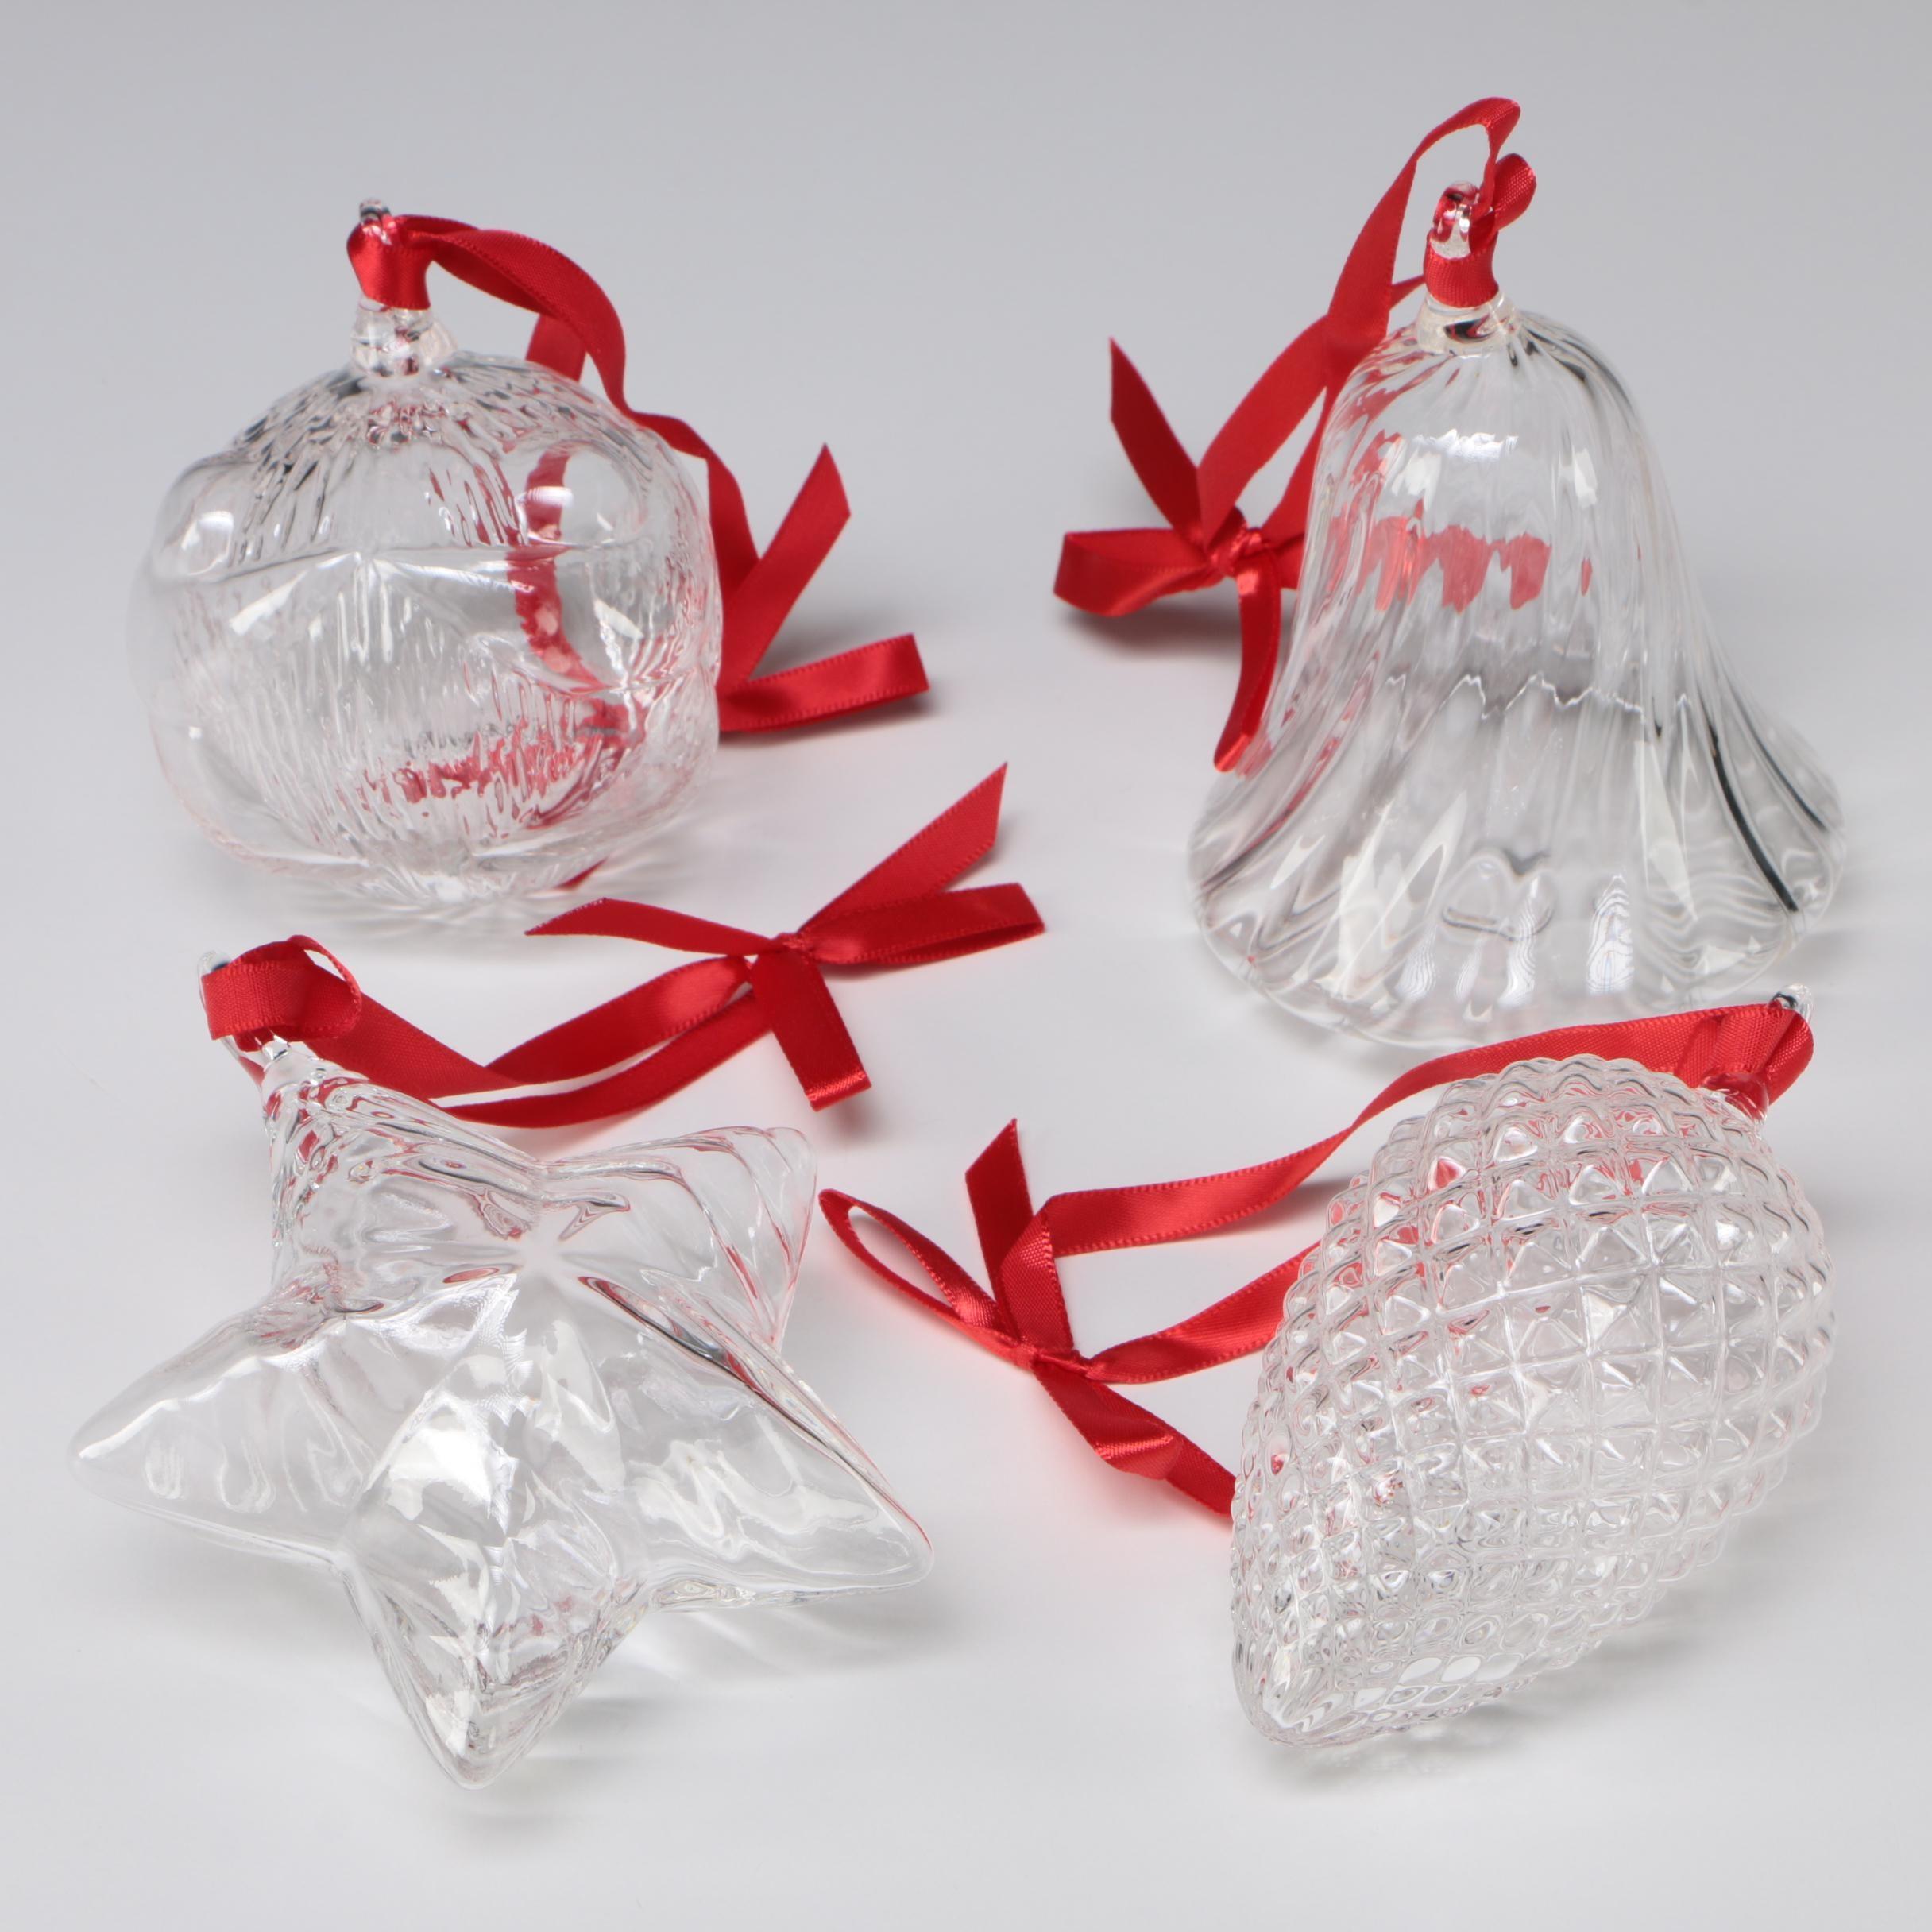 Steuben Art Glass Christmas Ornaments, 2000s